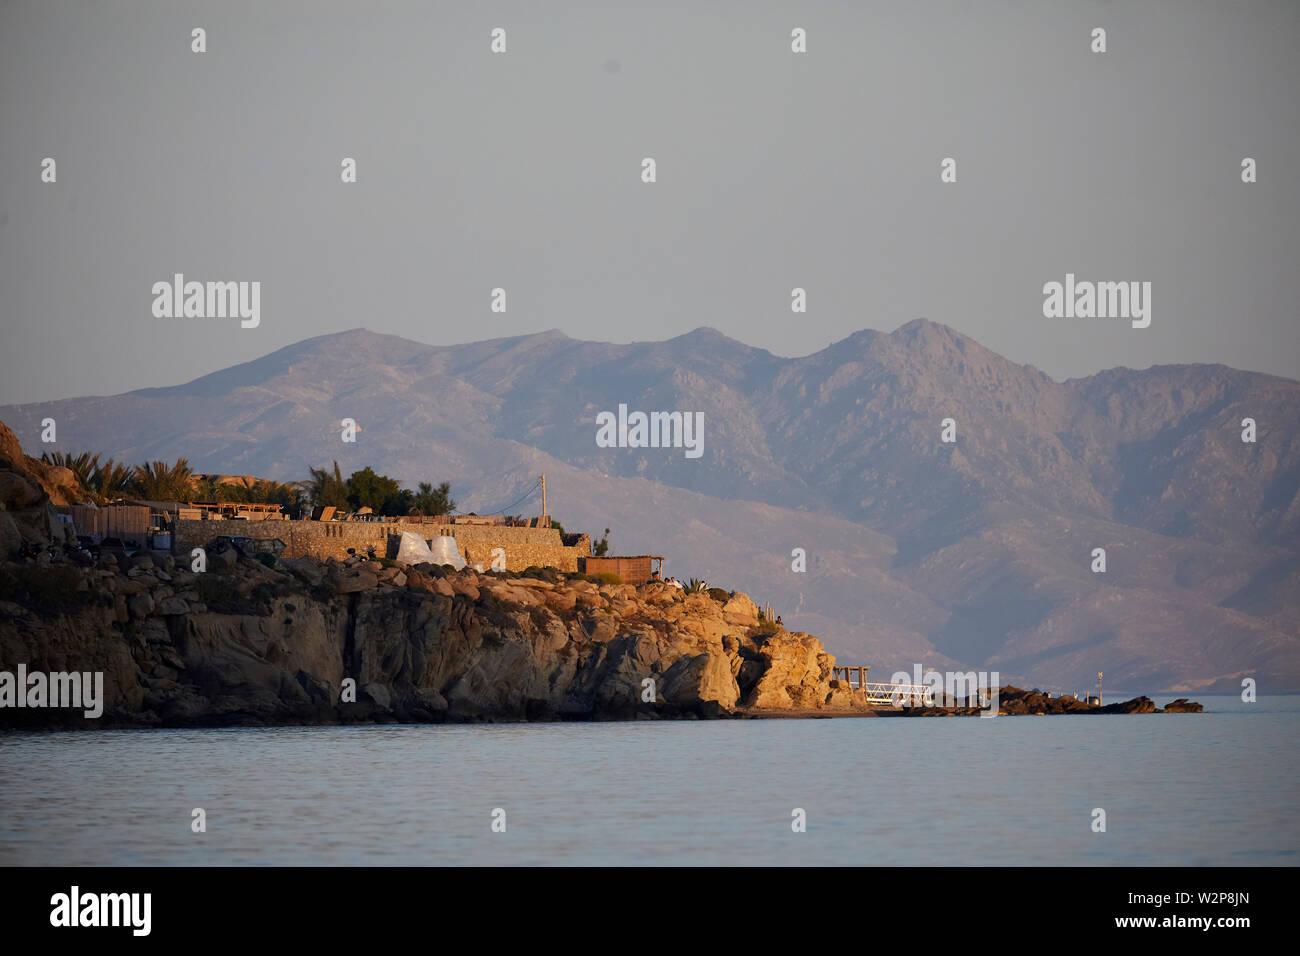 Mykonos, ˈmikonos Greek island, part of the Cyclades, Greece. Platis Gialos with Delos beyond  ? - Stock Image